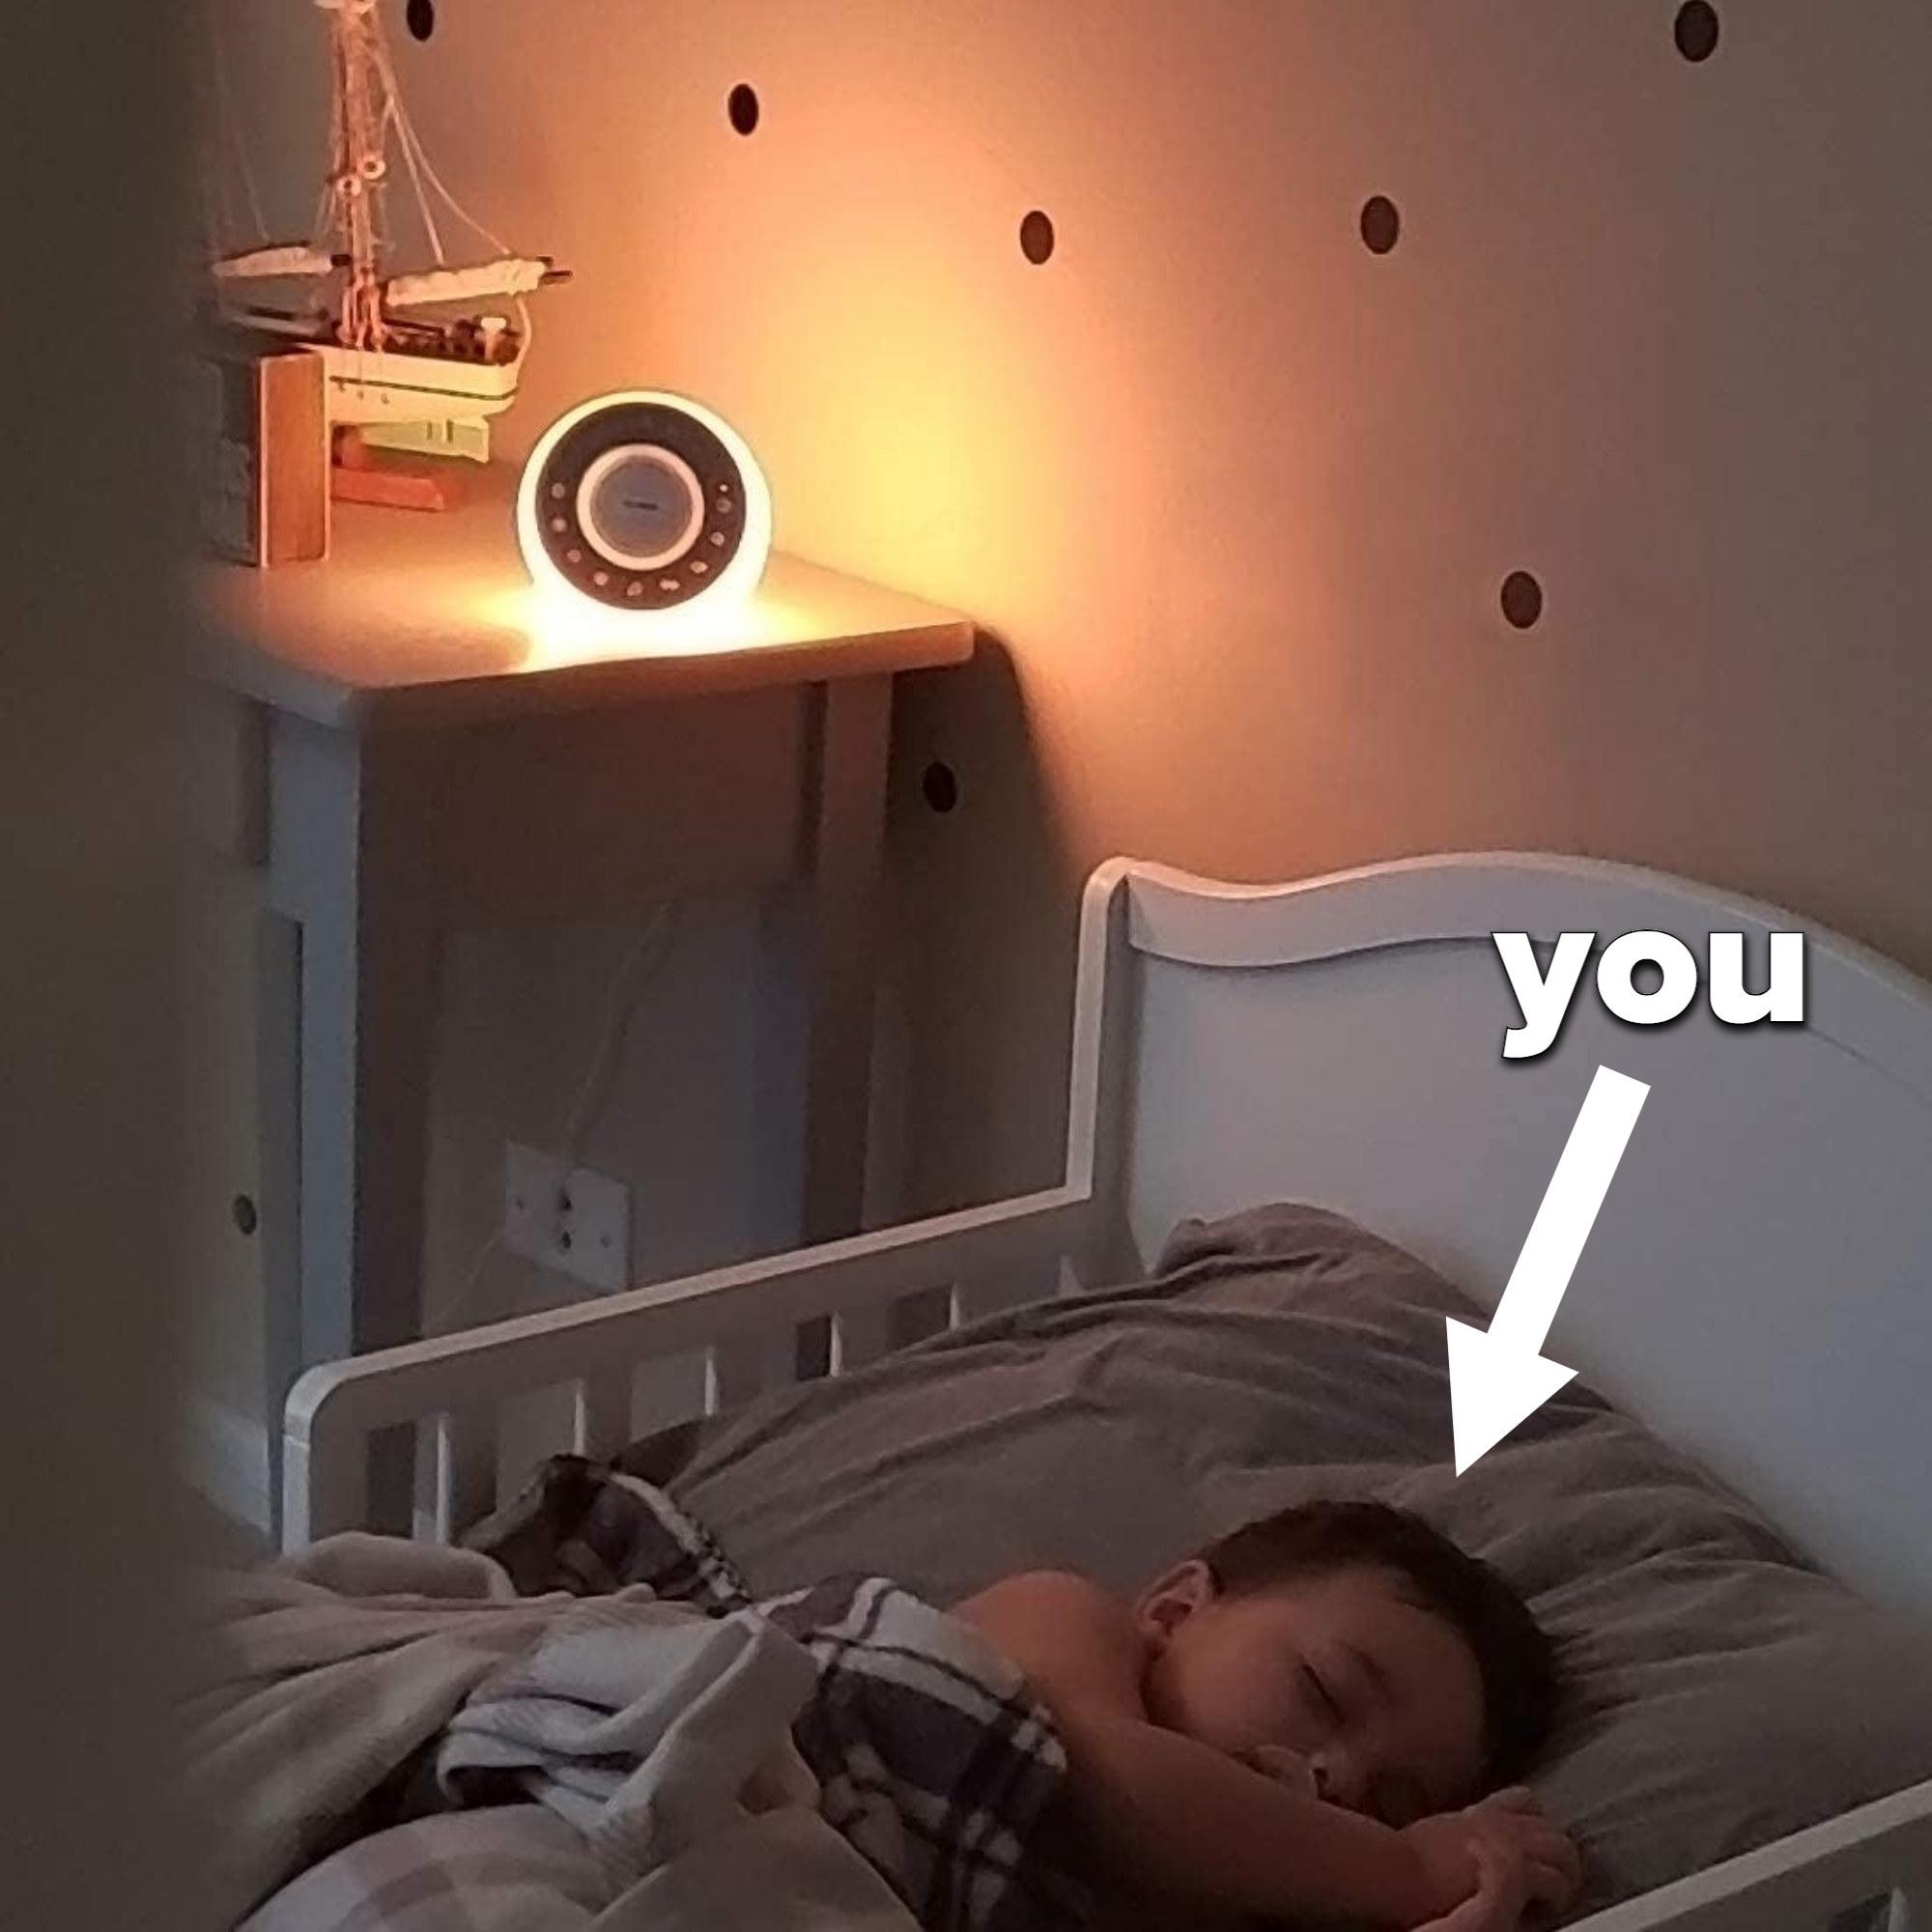 A toddler sleeping beside the white noise night light